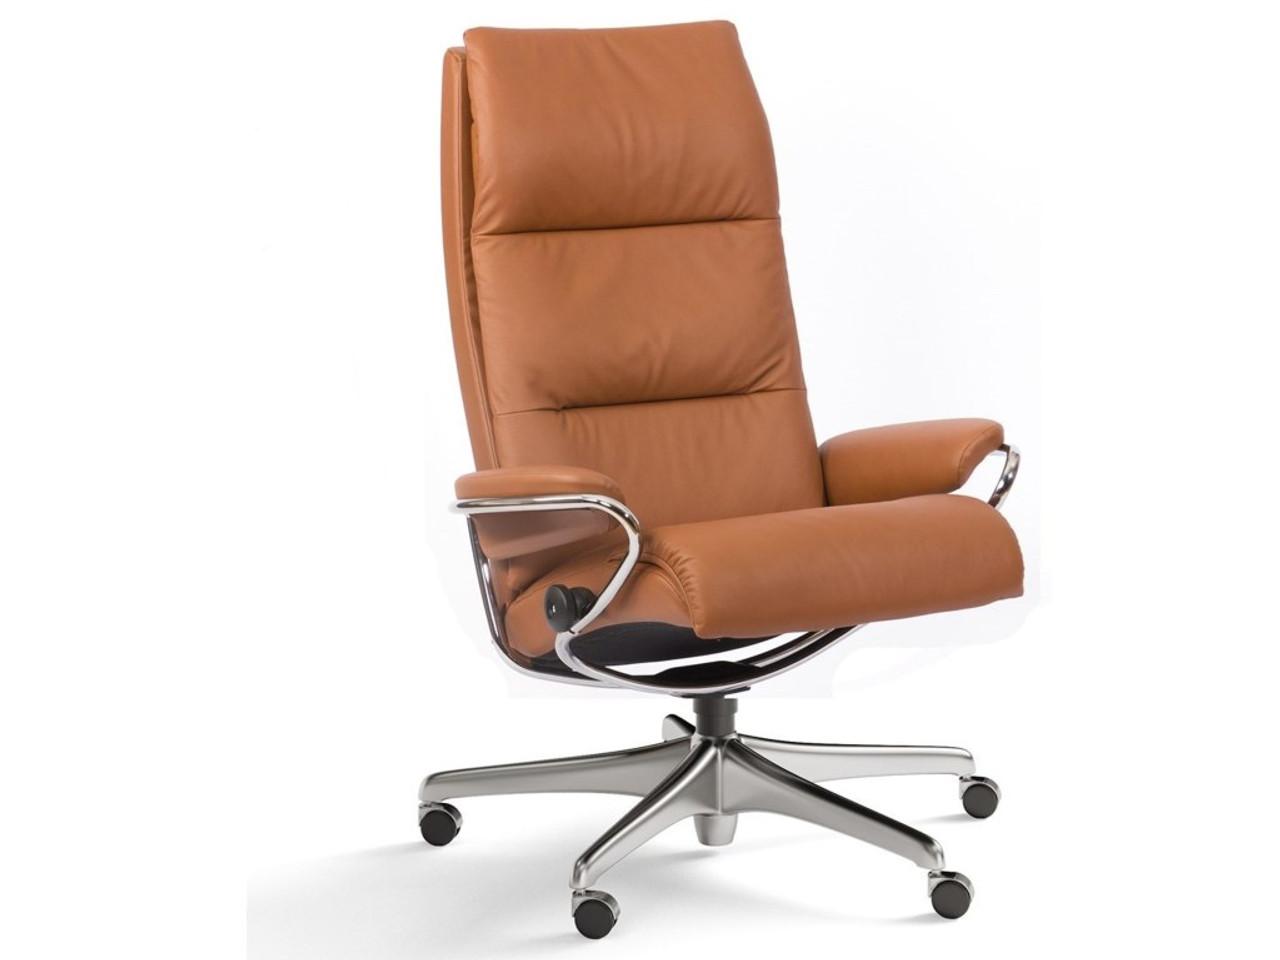 Surprising Stressless Tokyo Office Chair High Back Machost Co Dining Chair Design Ideas Machostcouk